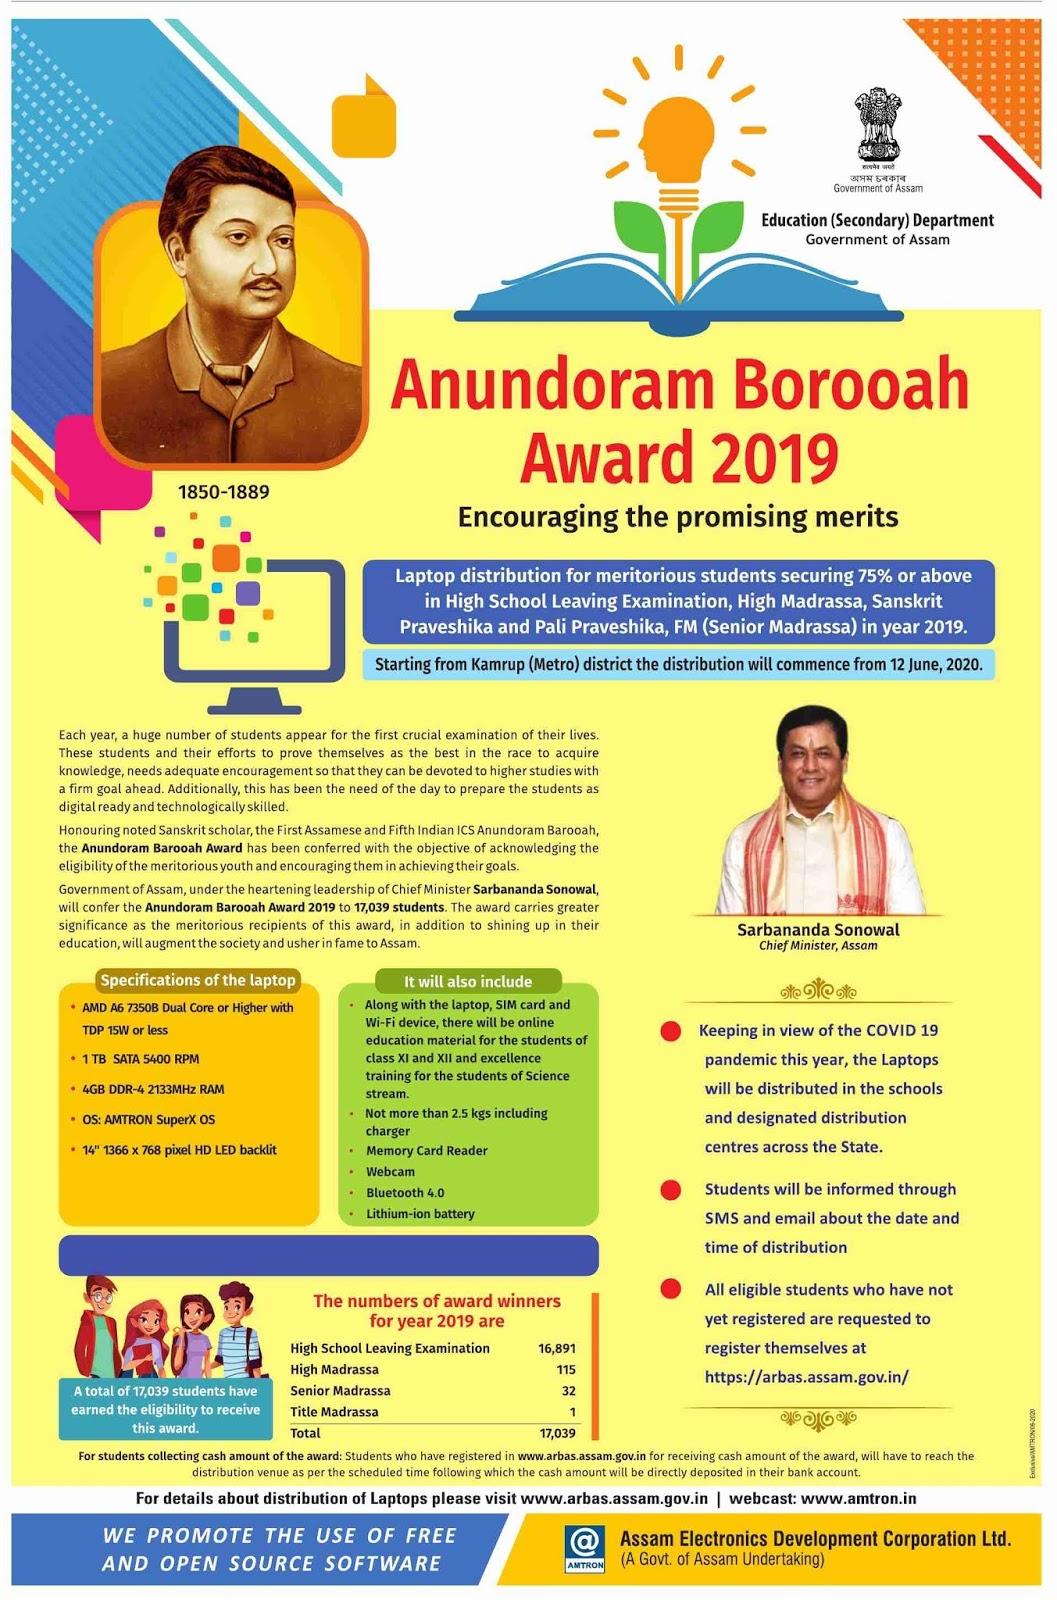 Anundoram Borooah Award Scheme 2019: Download District Wise Distribution Schedule @ Arbas.Assam.Gov.In